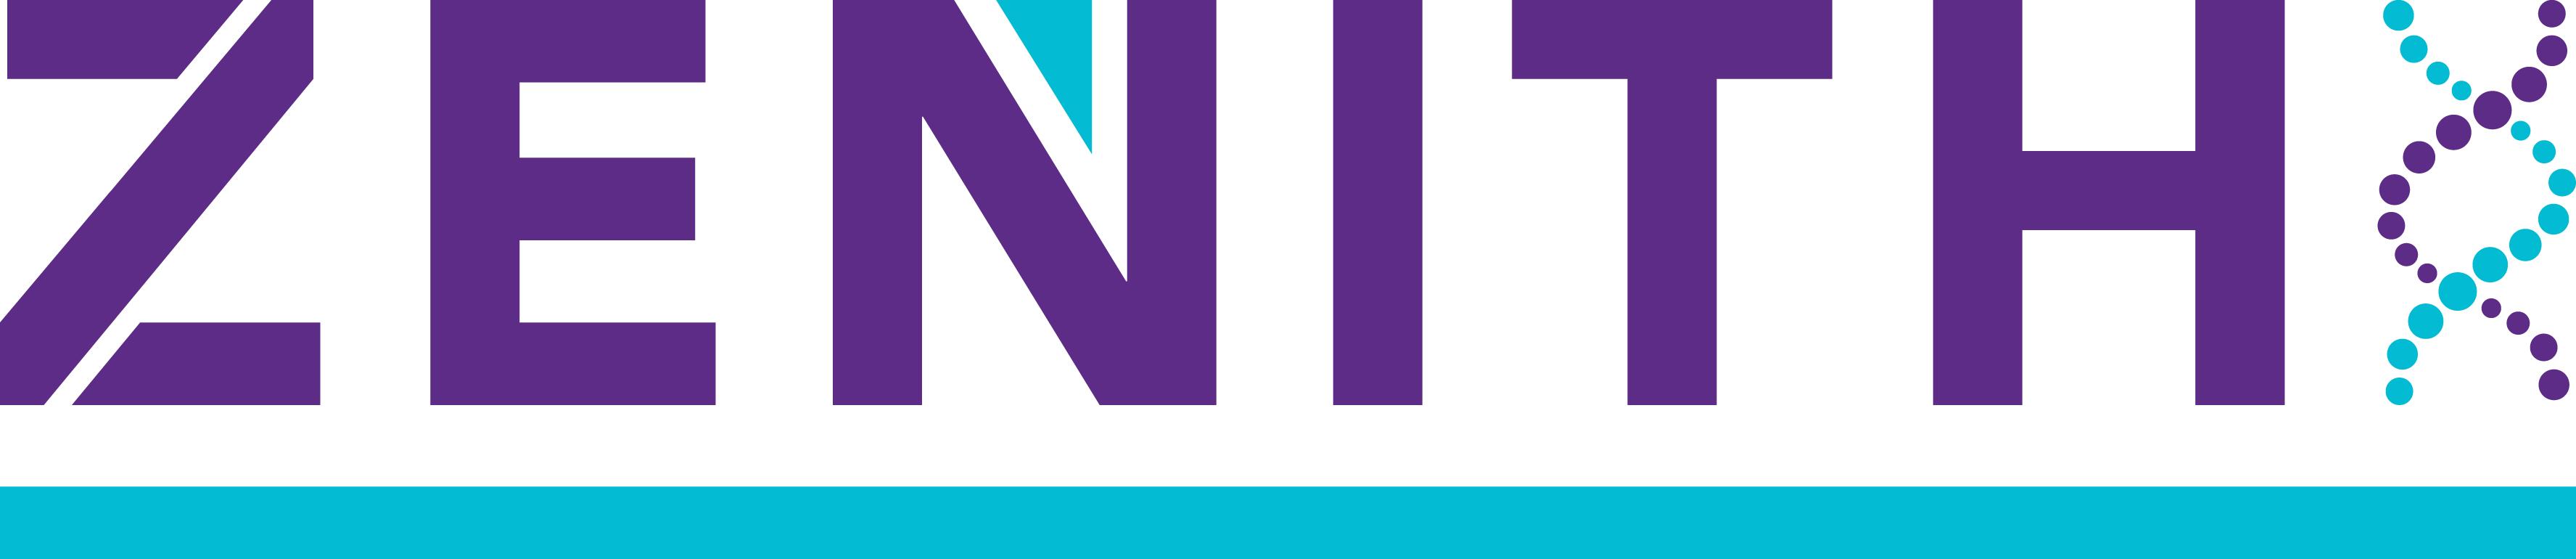 Zenith Epigenetics Receives US$5 Million Milestone Payment from Newsoara